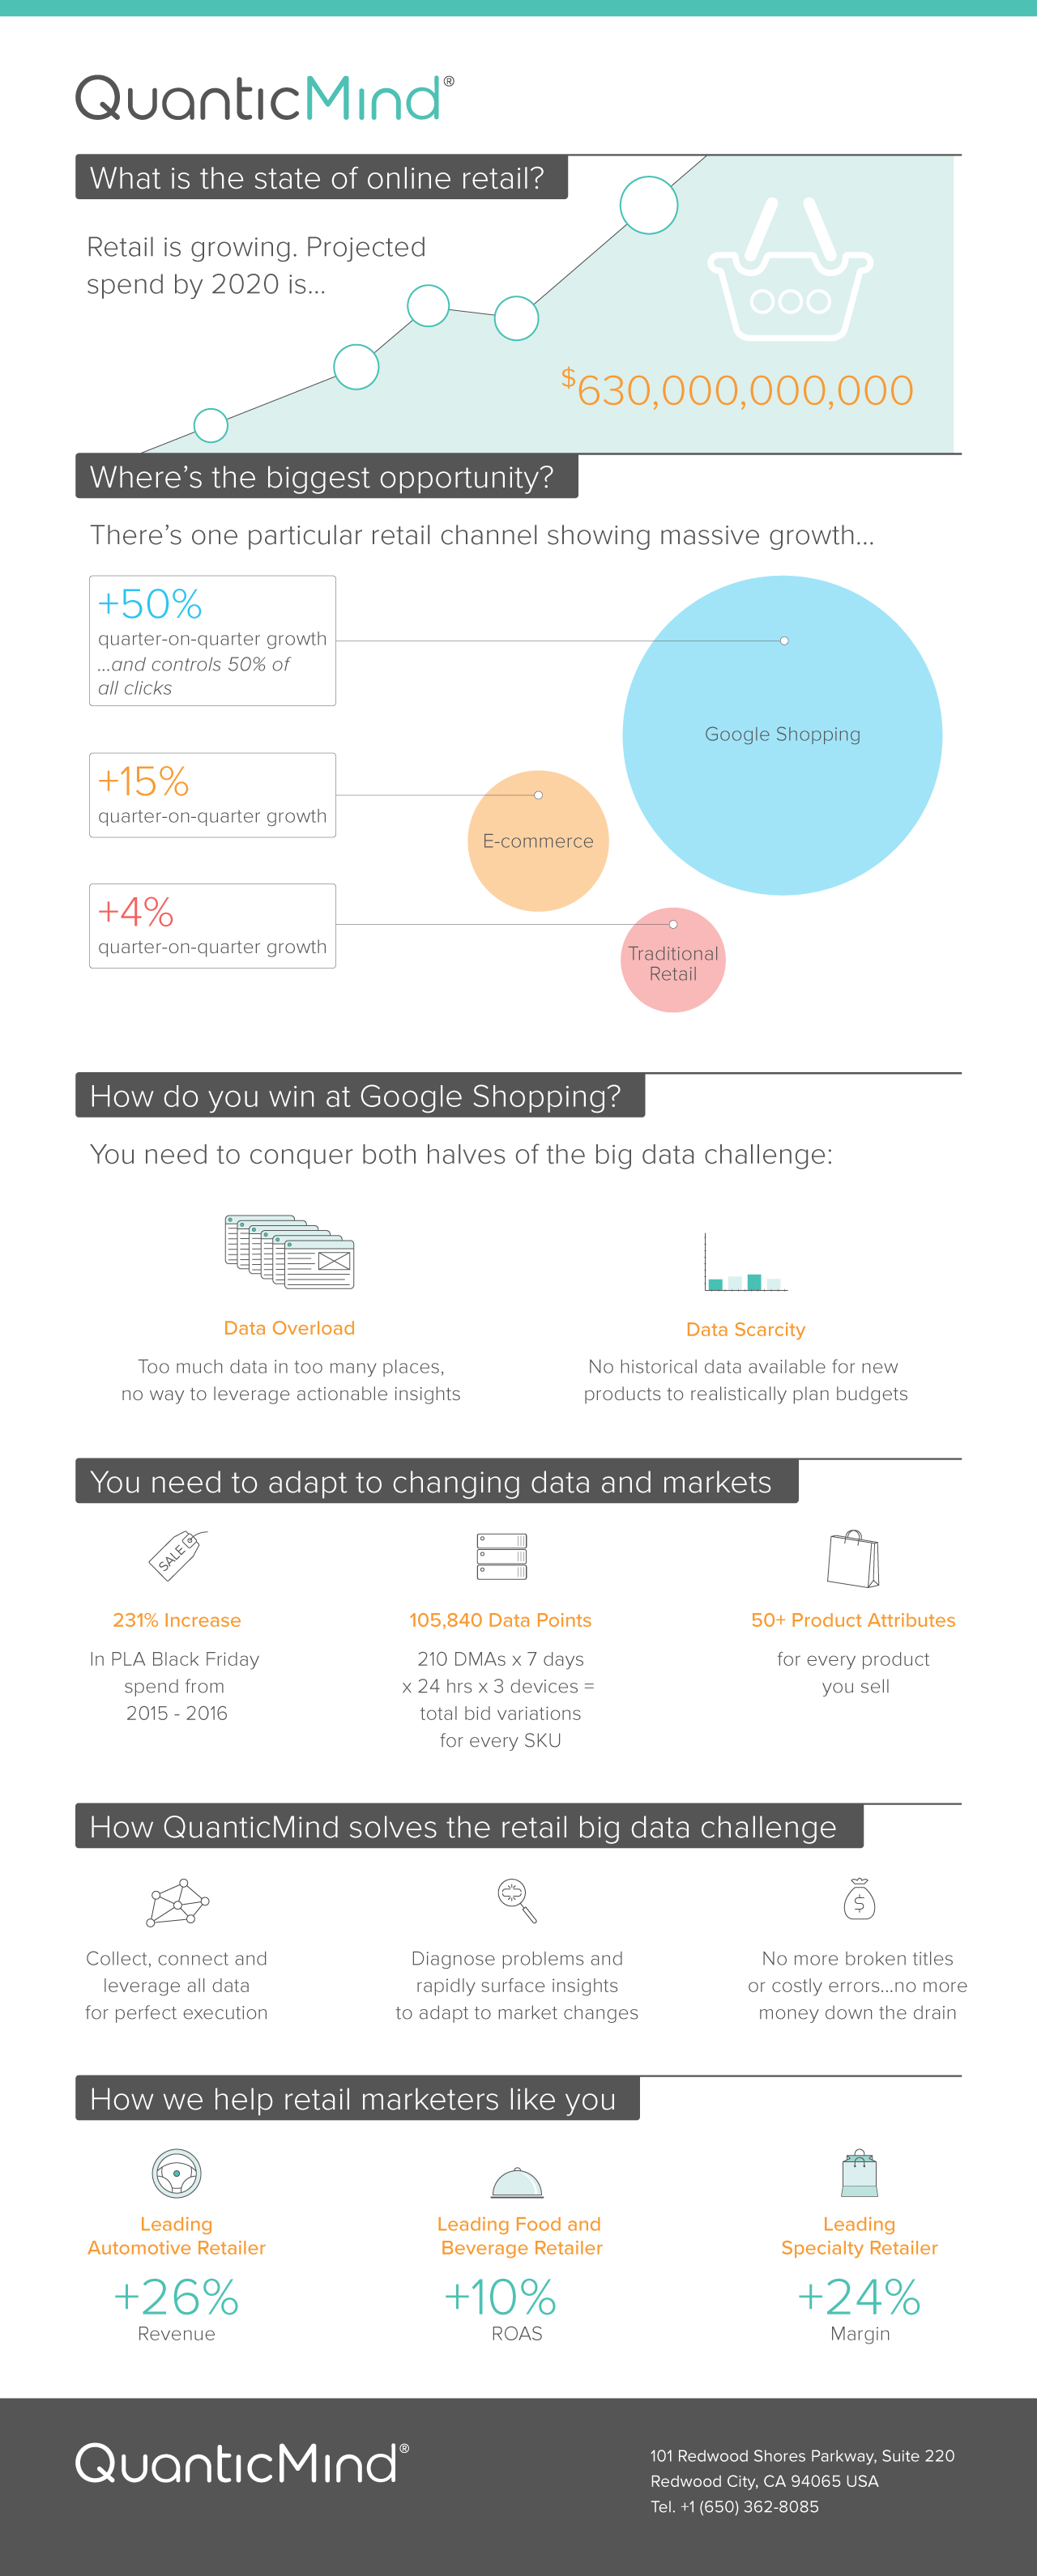 Solving Retail's Big Data Challenge